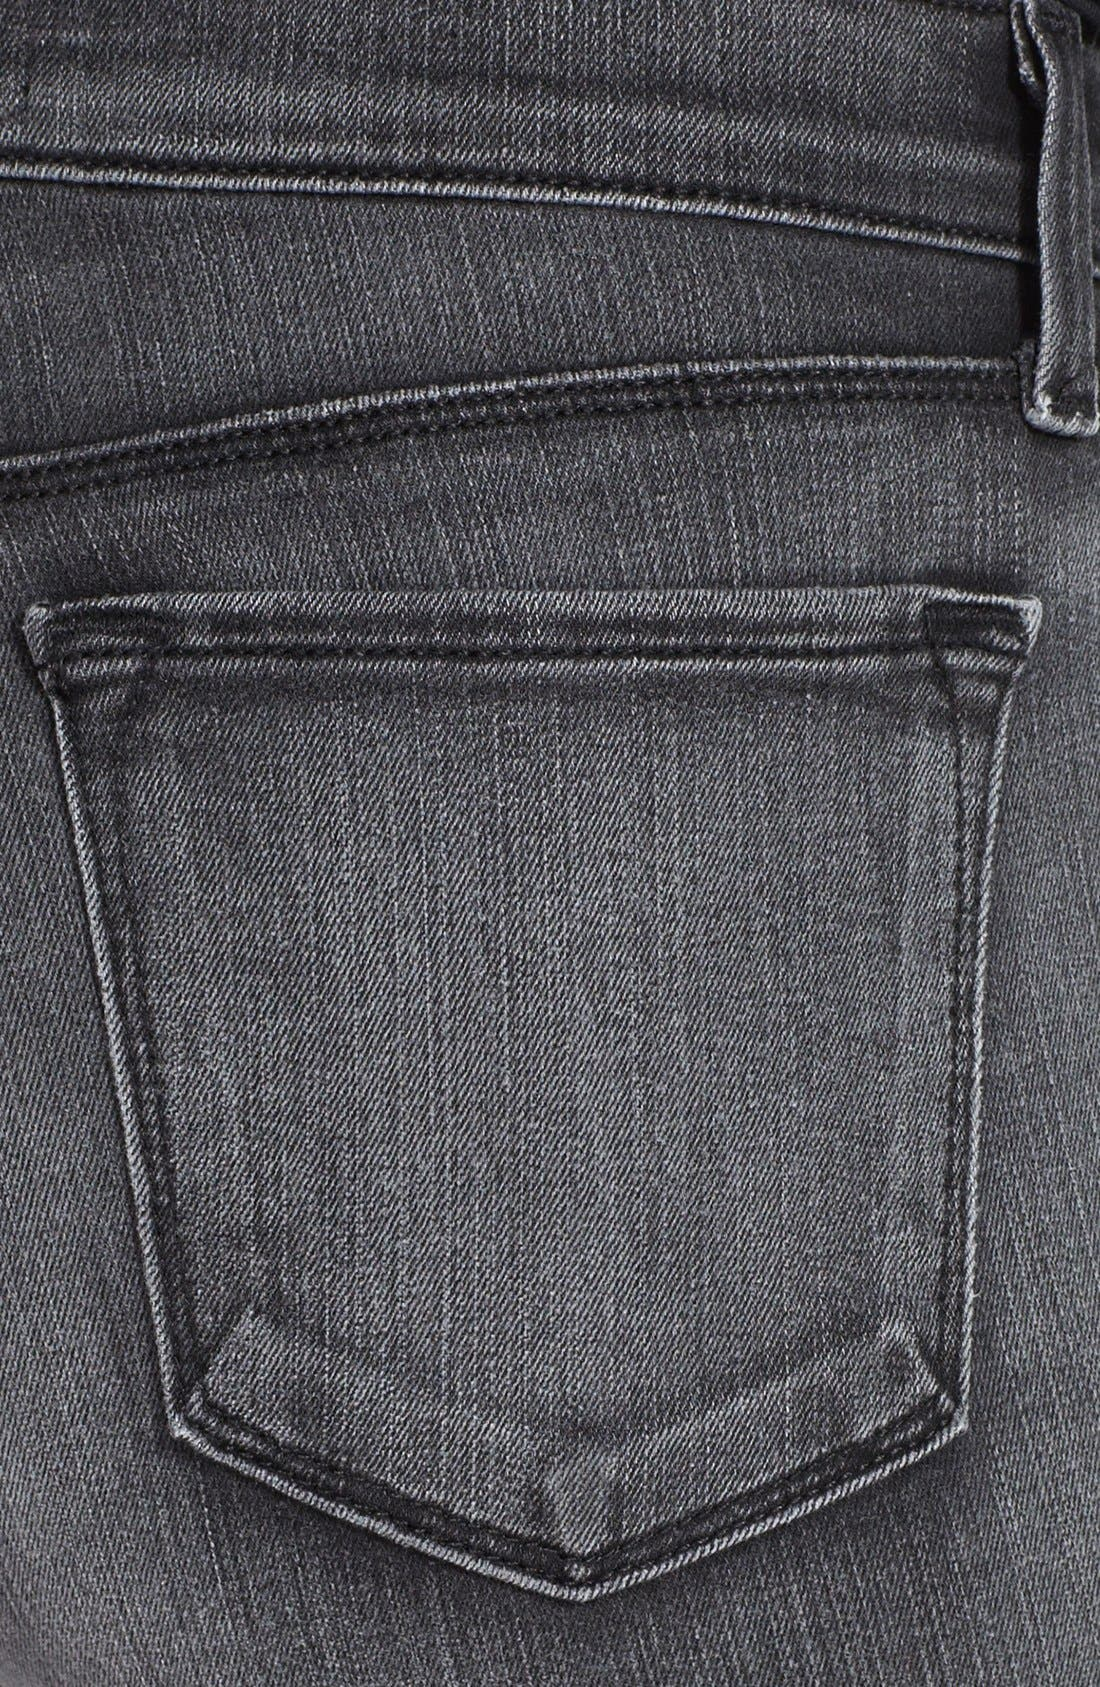 ,                             '620' Mid Rise Skinny Jeans,                             Alternate thumbnail 26, color,                             032